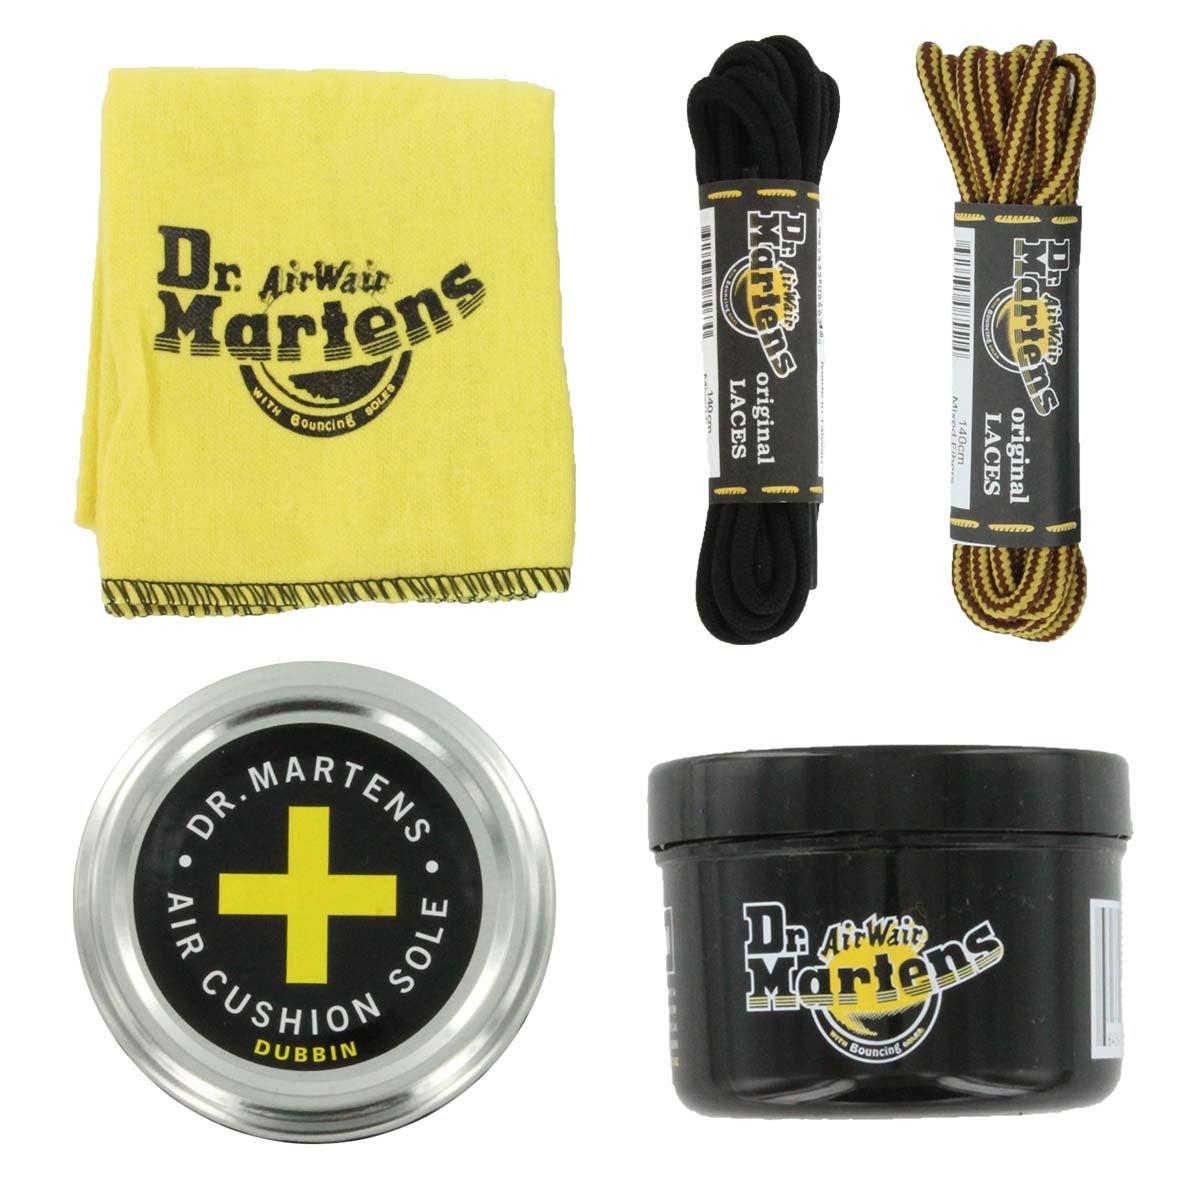 Dr. Martens Shoe Care Kit